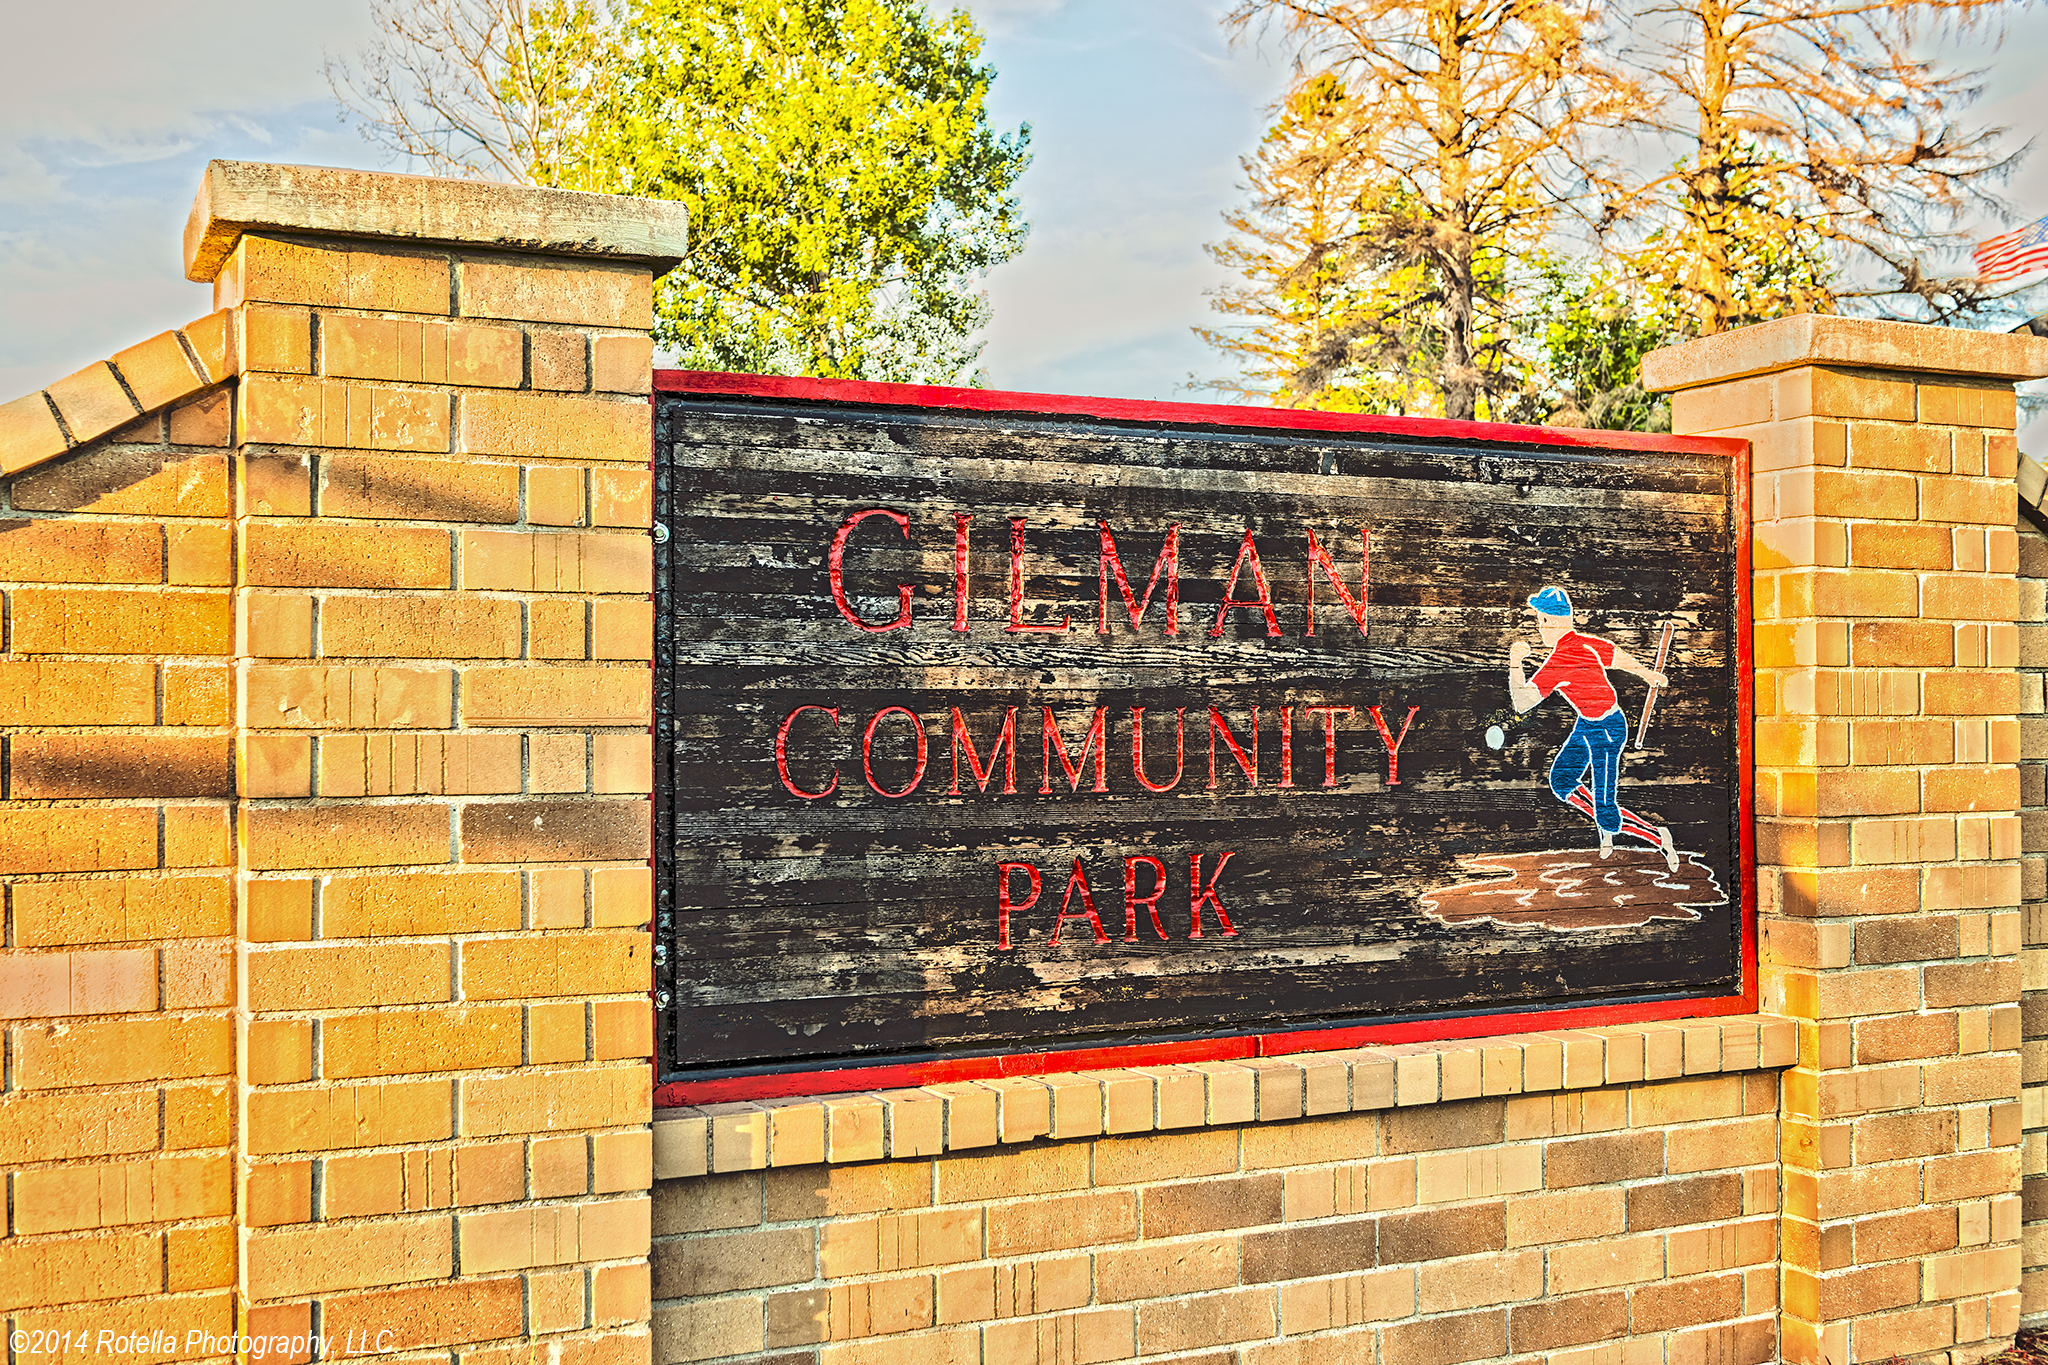 Gilman Community Park